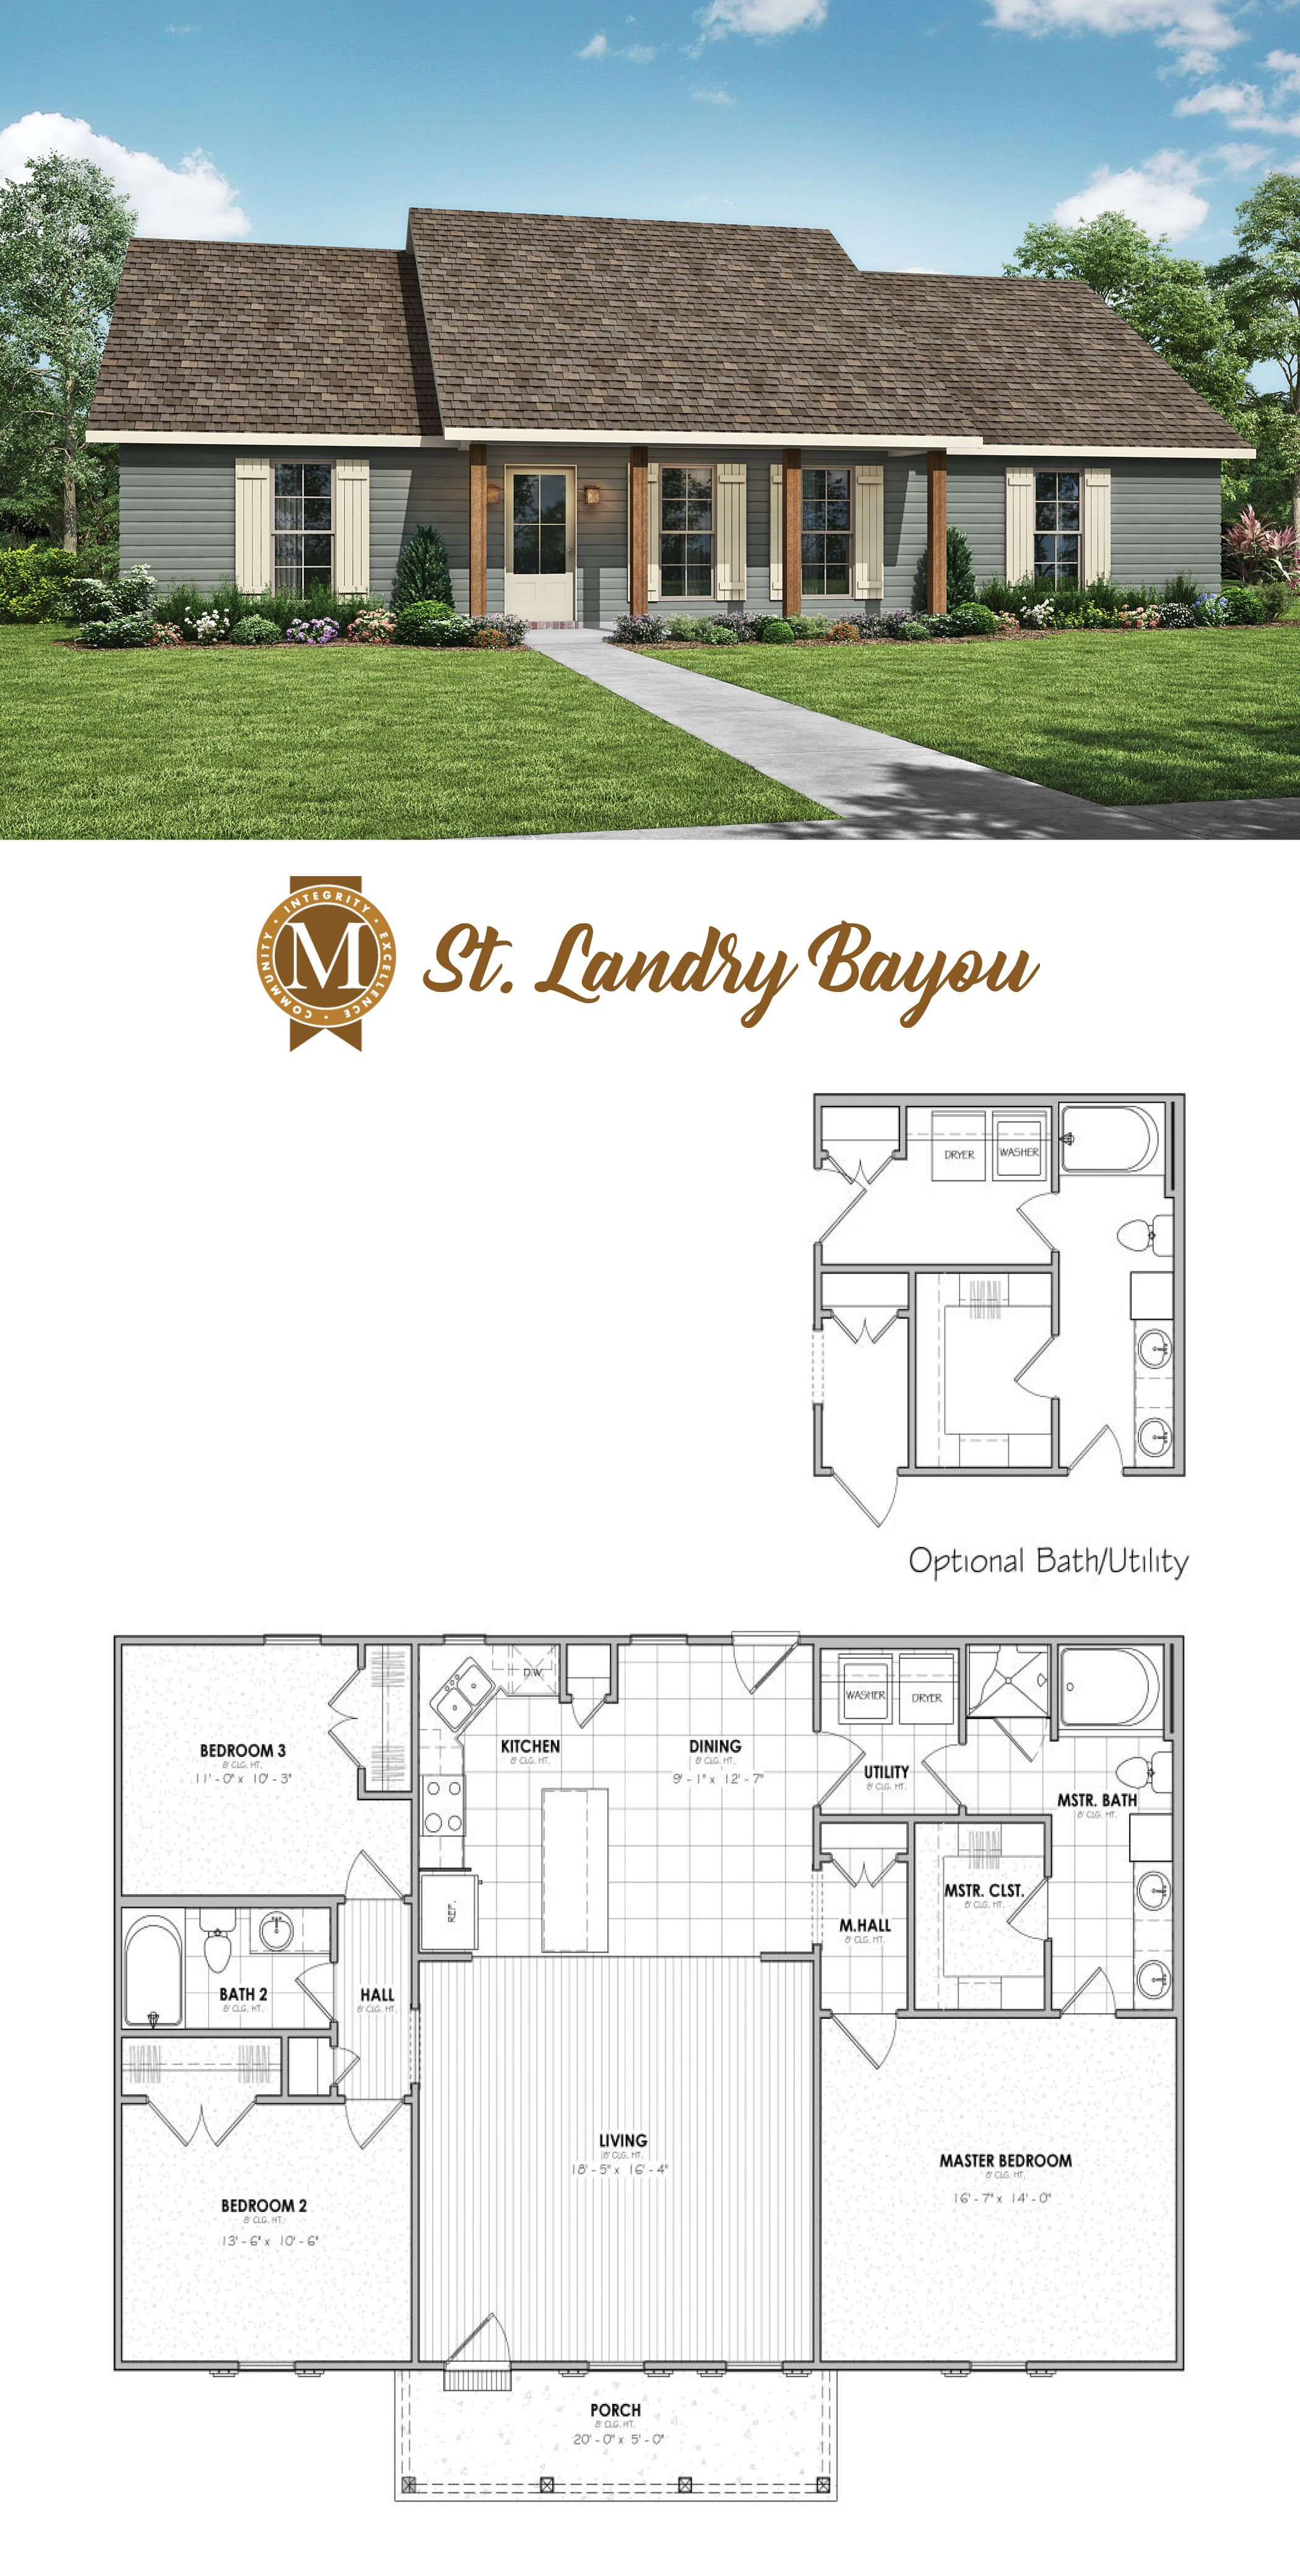 Living Sq Ft: 1,500 Bedrooms: 3 Baths: 2 Lafayette Lake